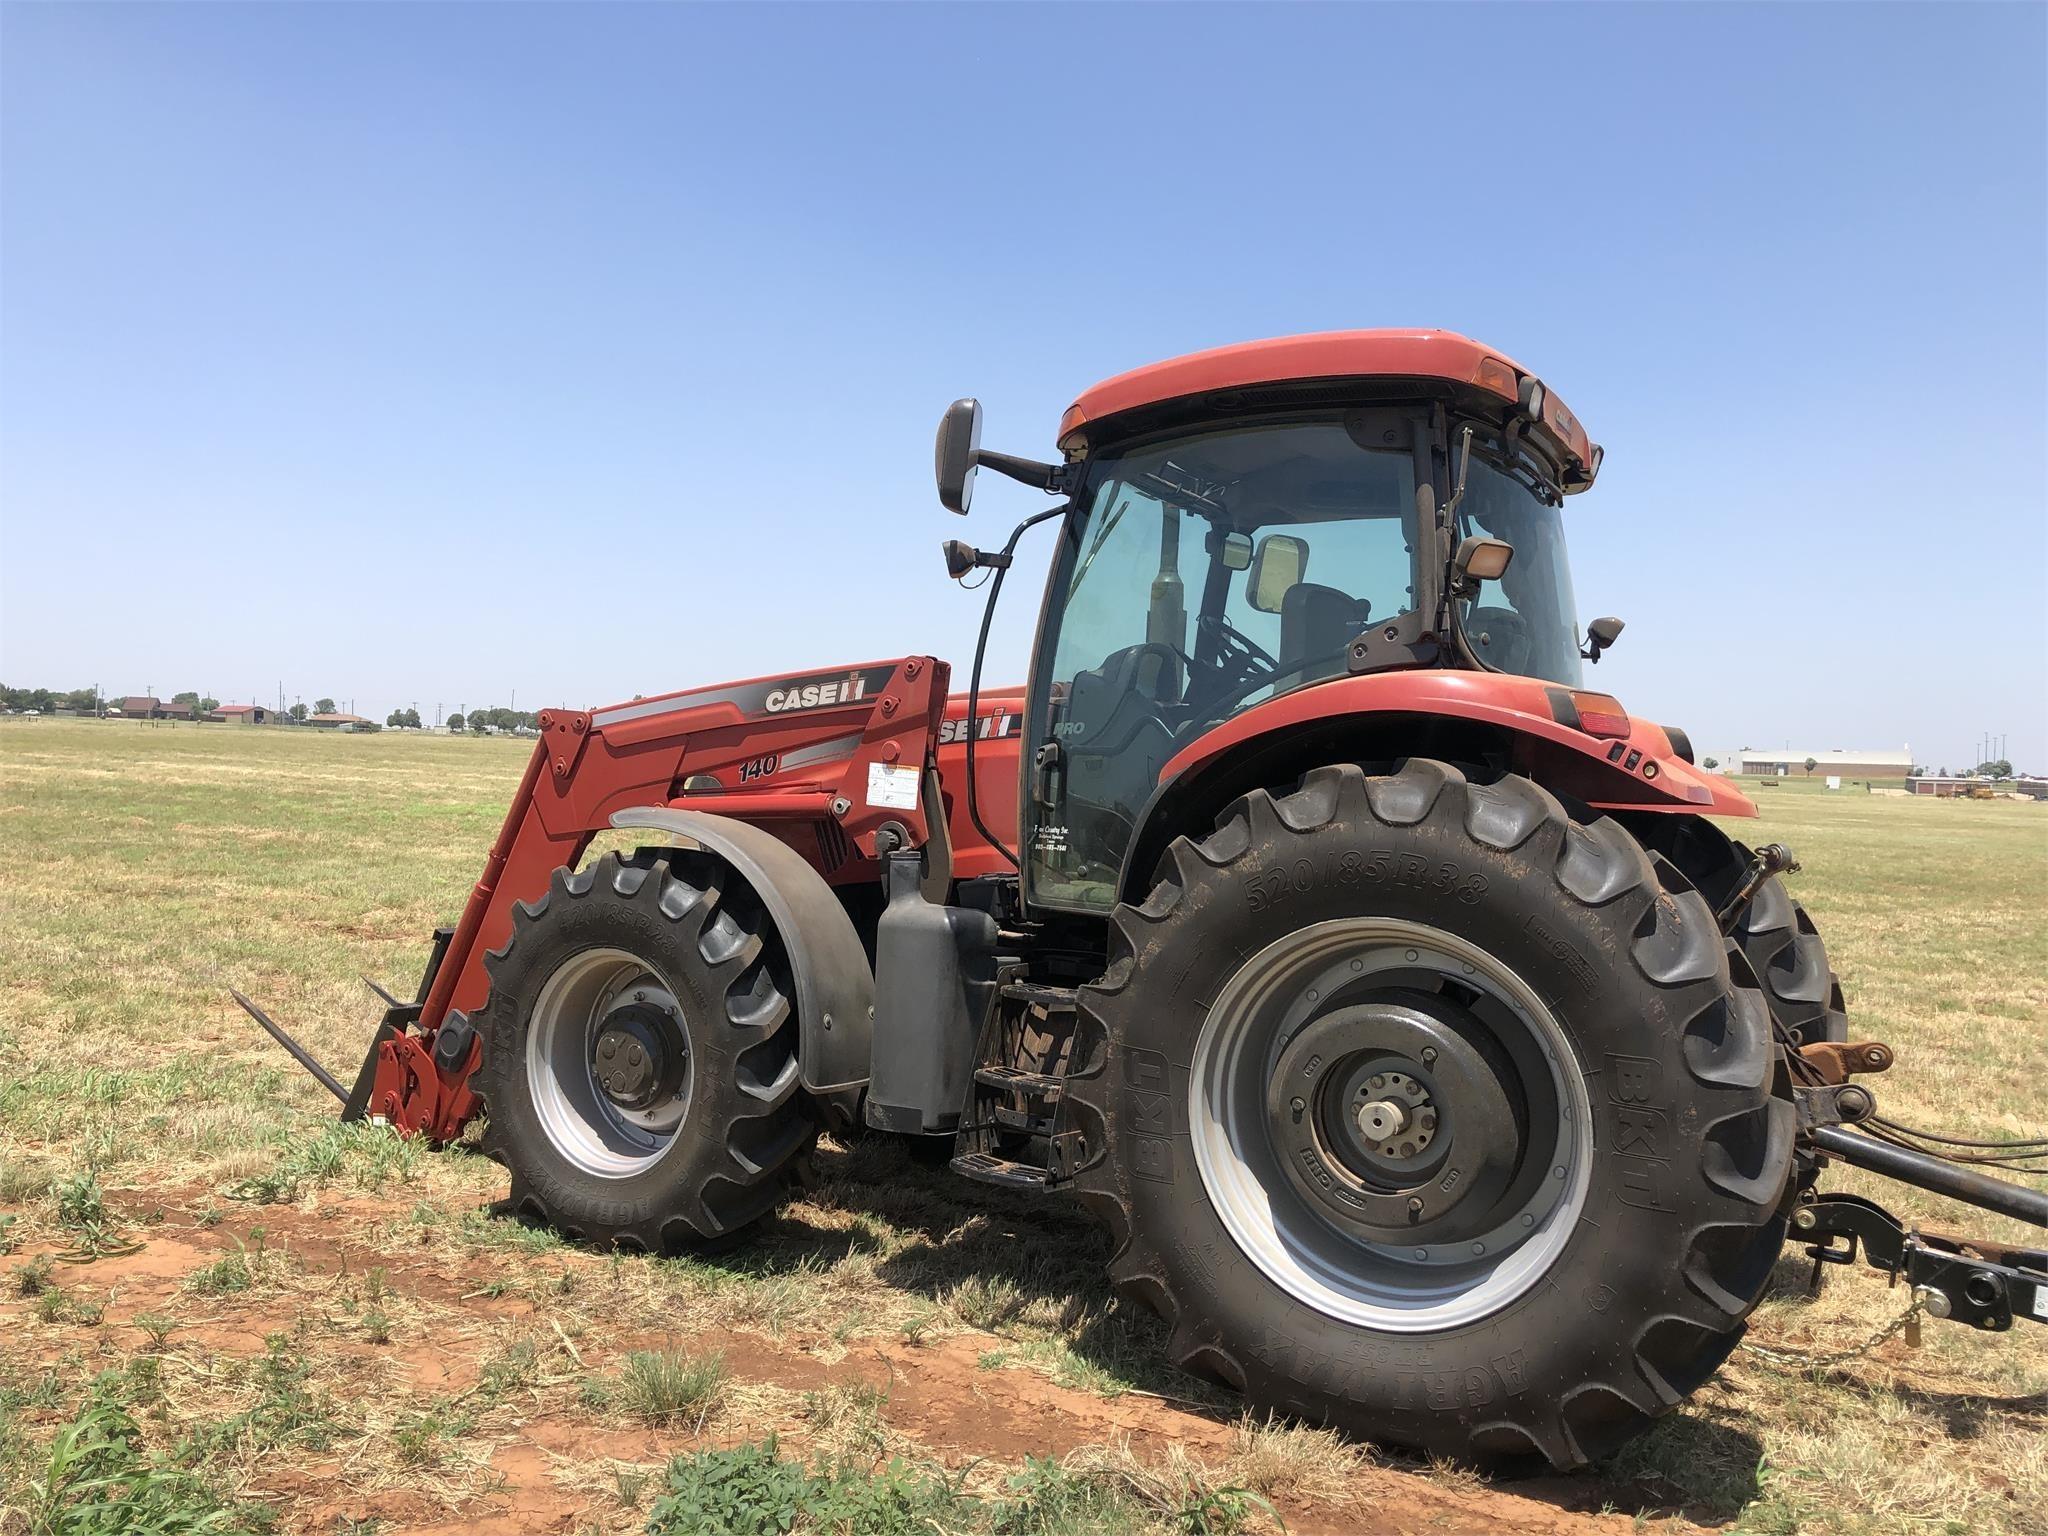 2011 Case IH Maxxum 140 Pro Tractor